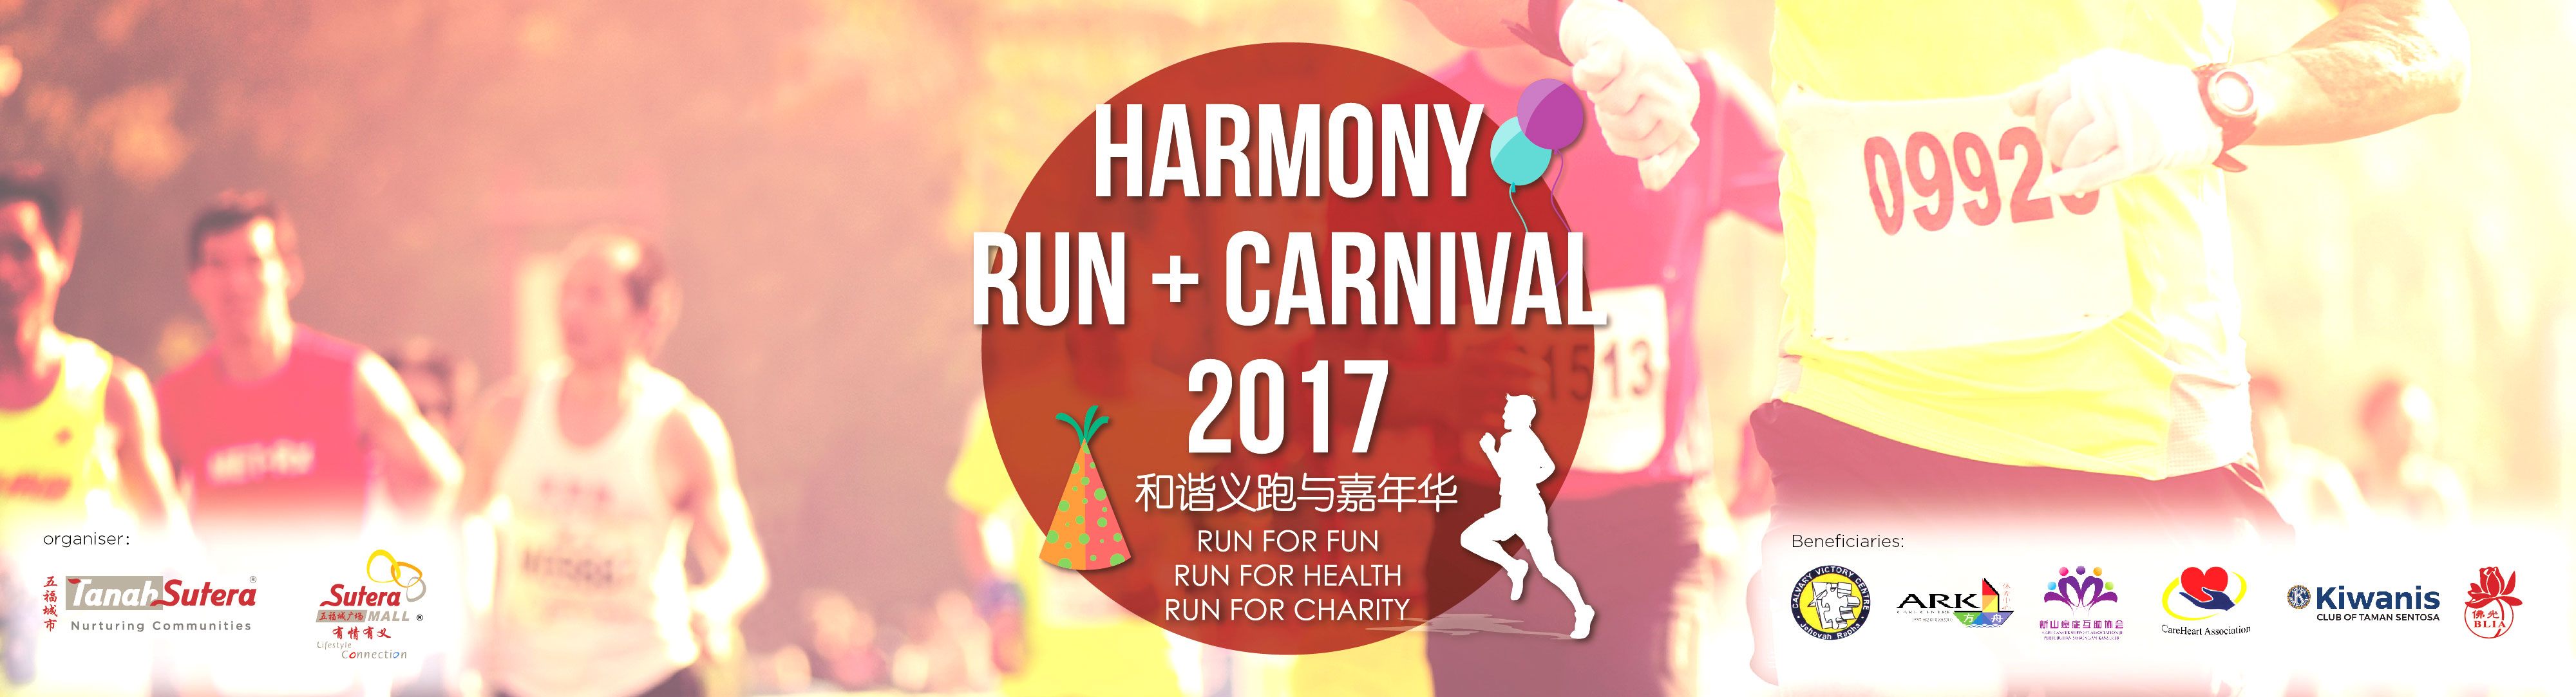 Harmony Run + Carnival 2017 Banner Image